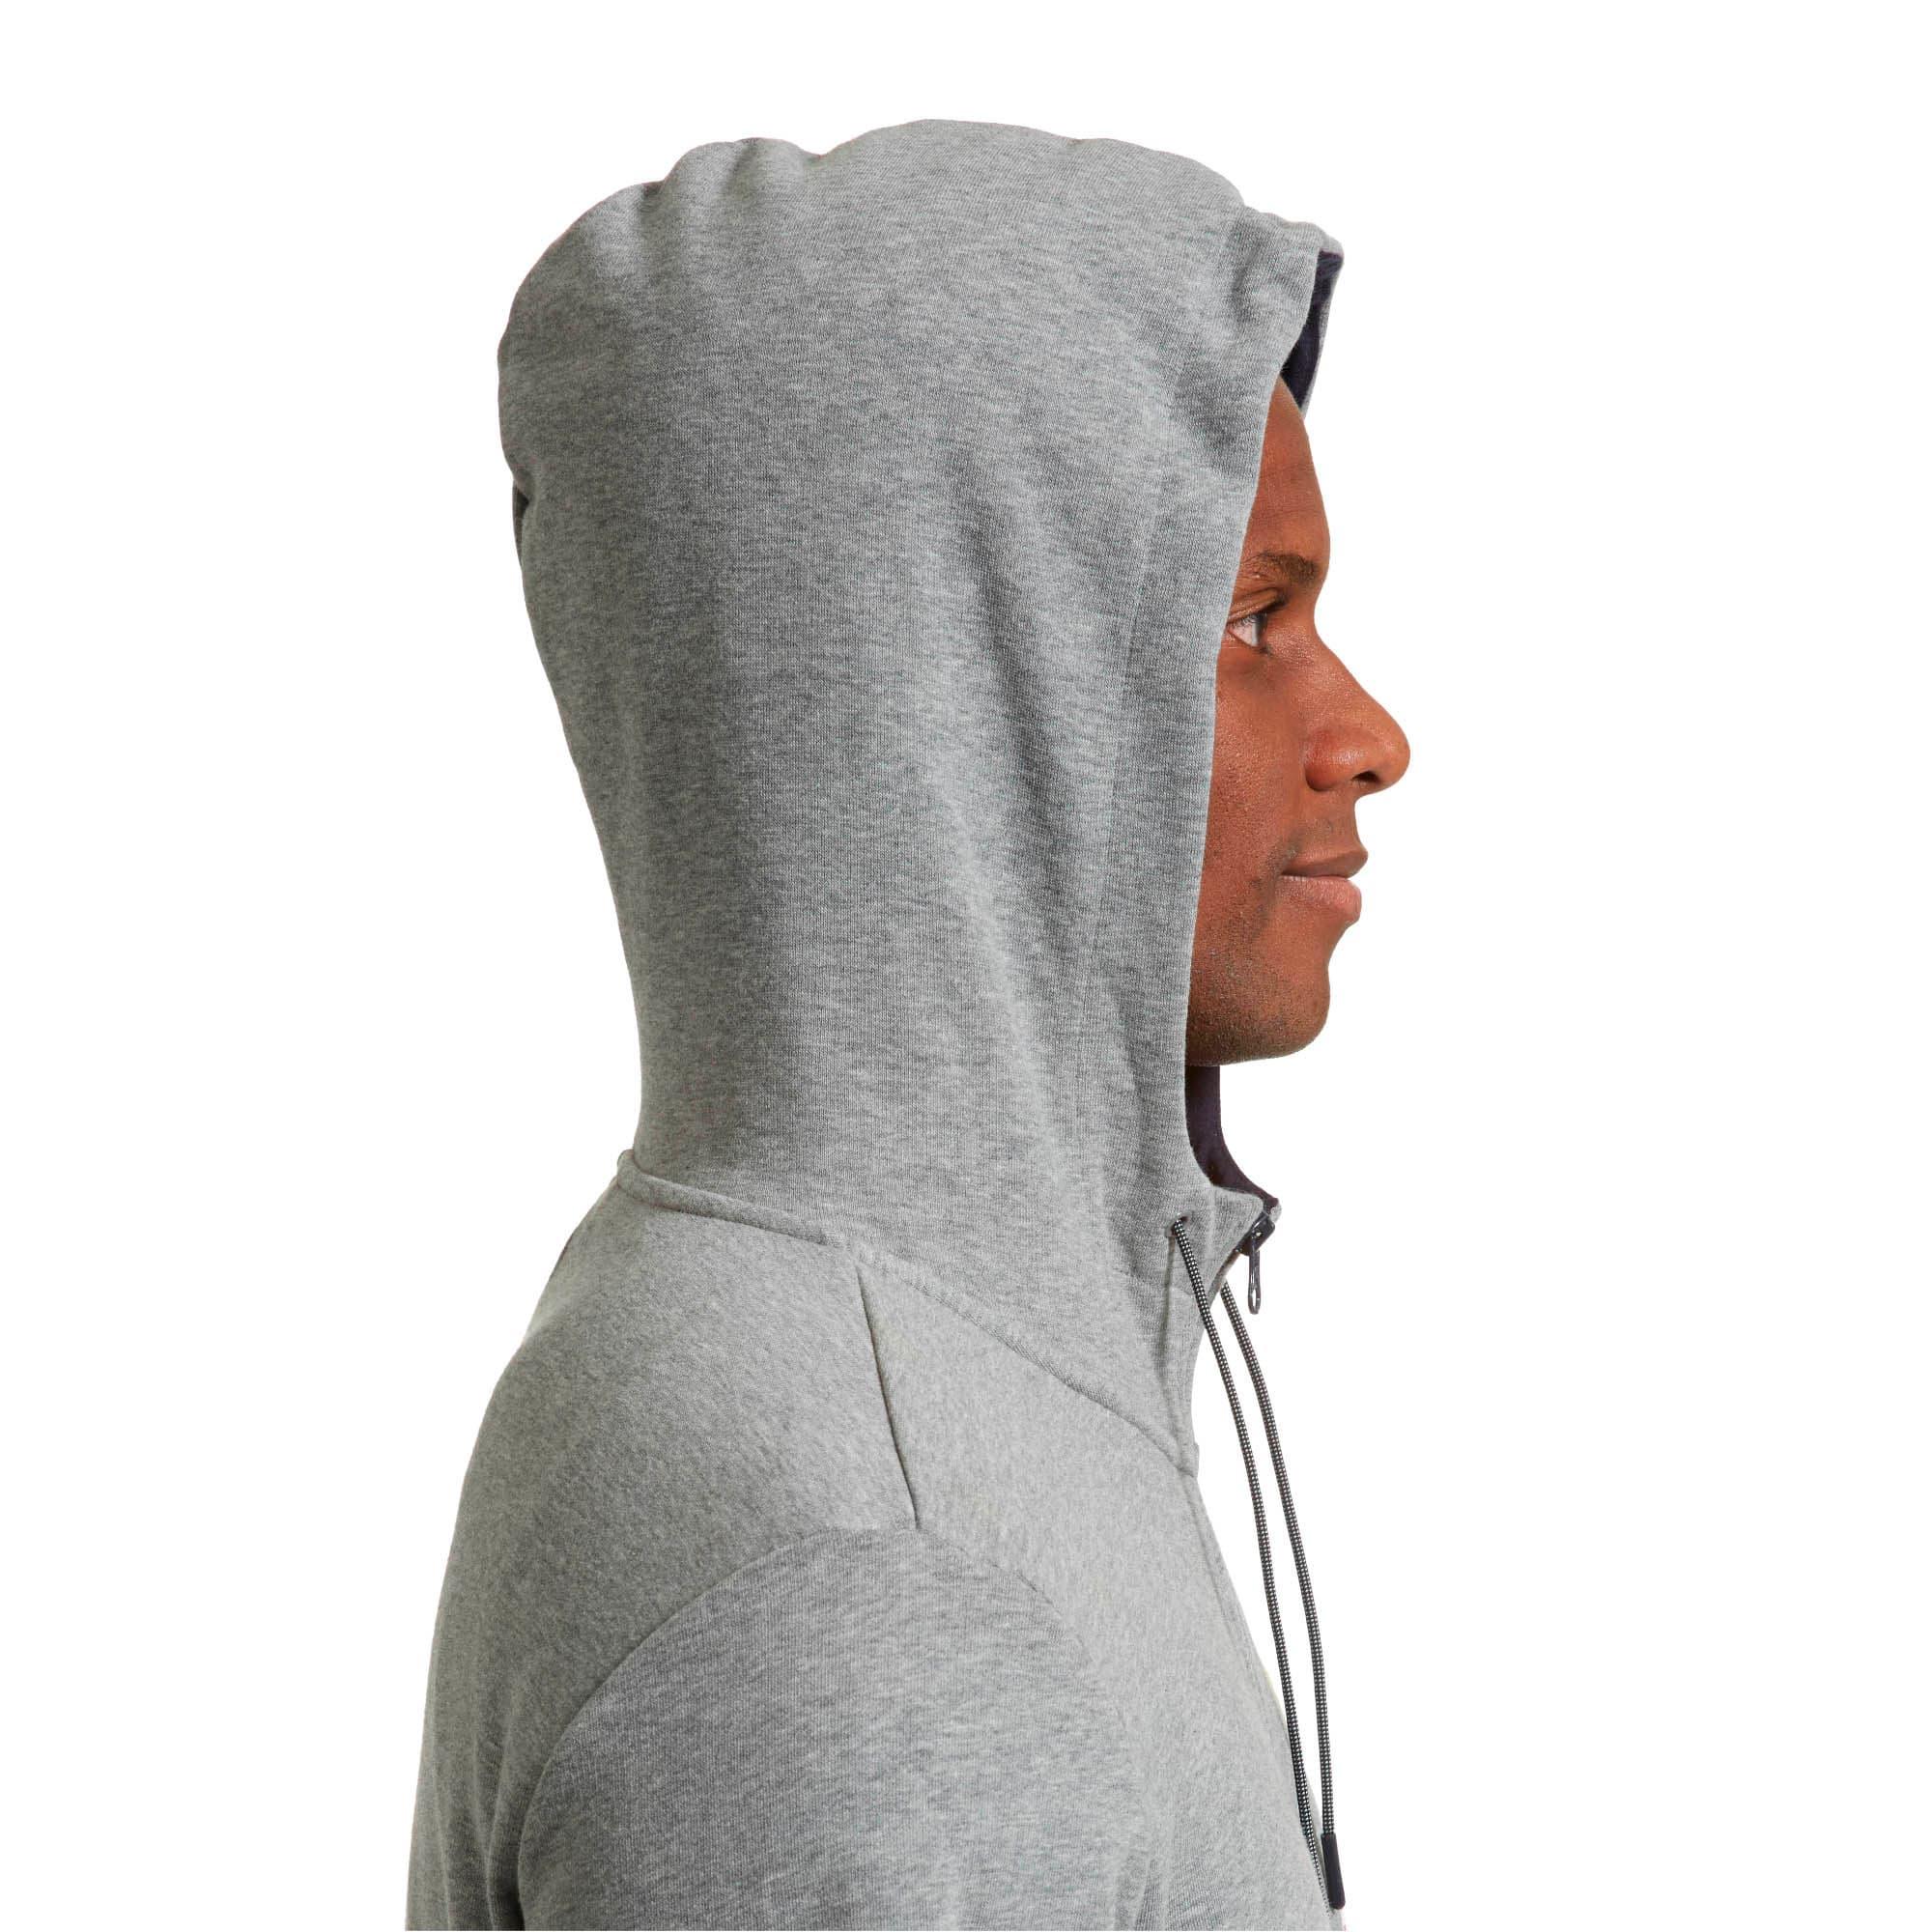 Thumbnail 4 of Red Bull Racing Lifestyle Men's Hooded Sweat Jacket, Medium Gray Heather - 1, medium